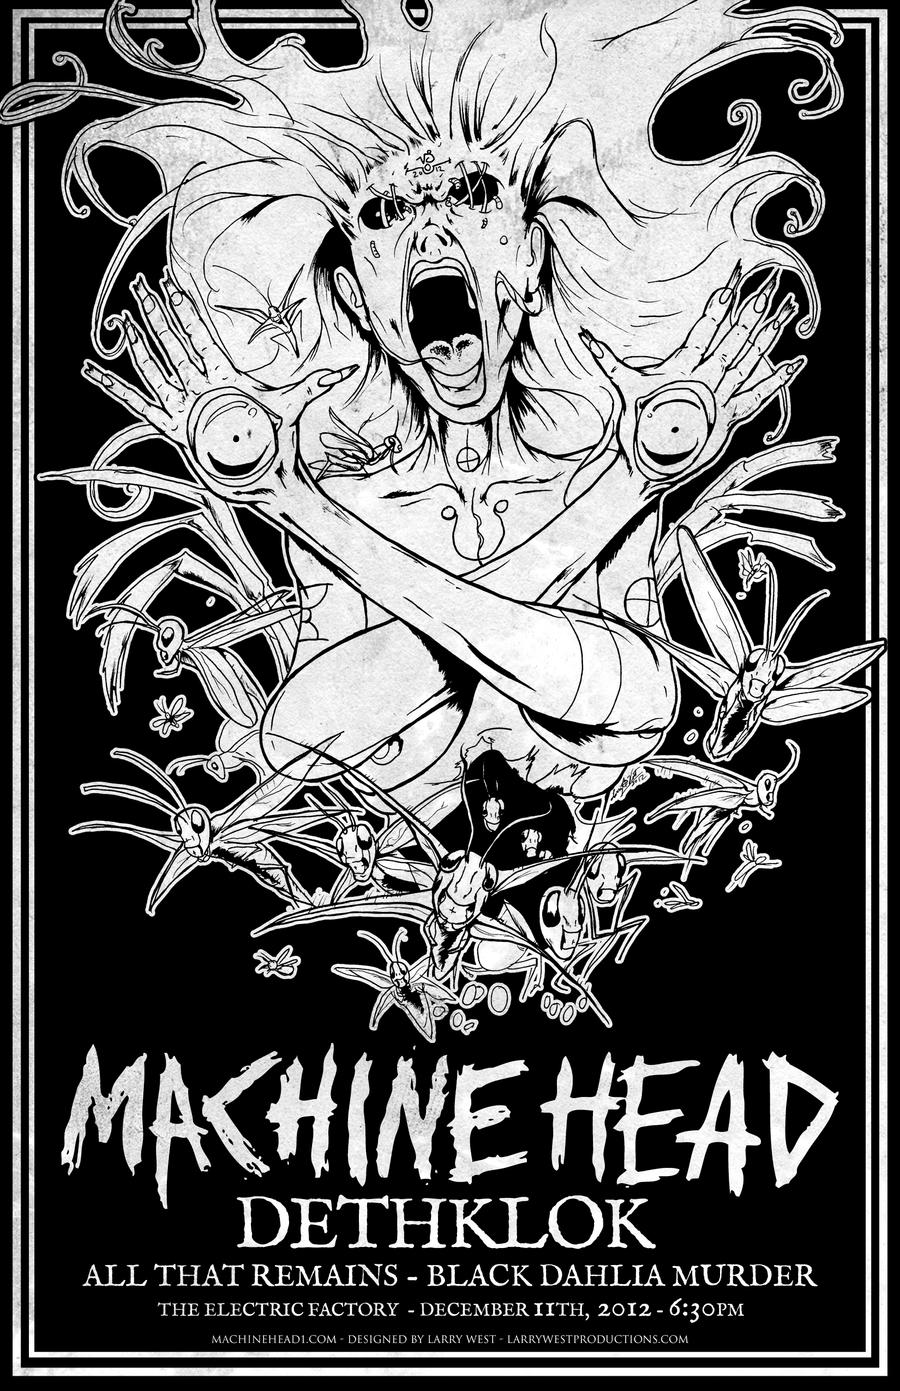 famine machine head dethklok 2012 gig poster by luvataciousskull on deviantart. Black Bedroom Furniture Sets. Home Design Ideas